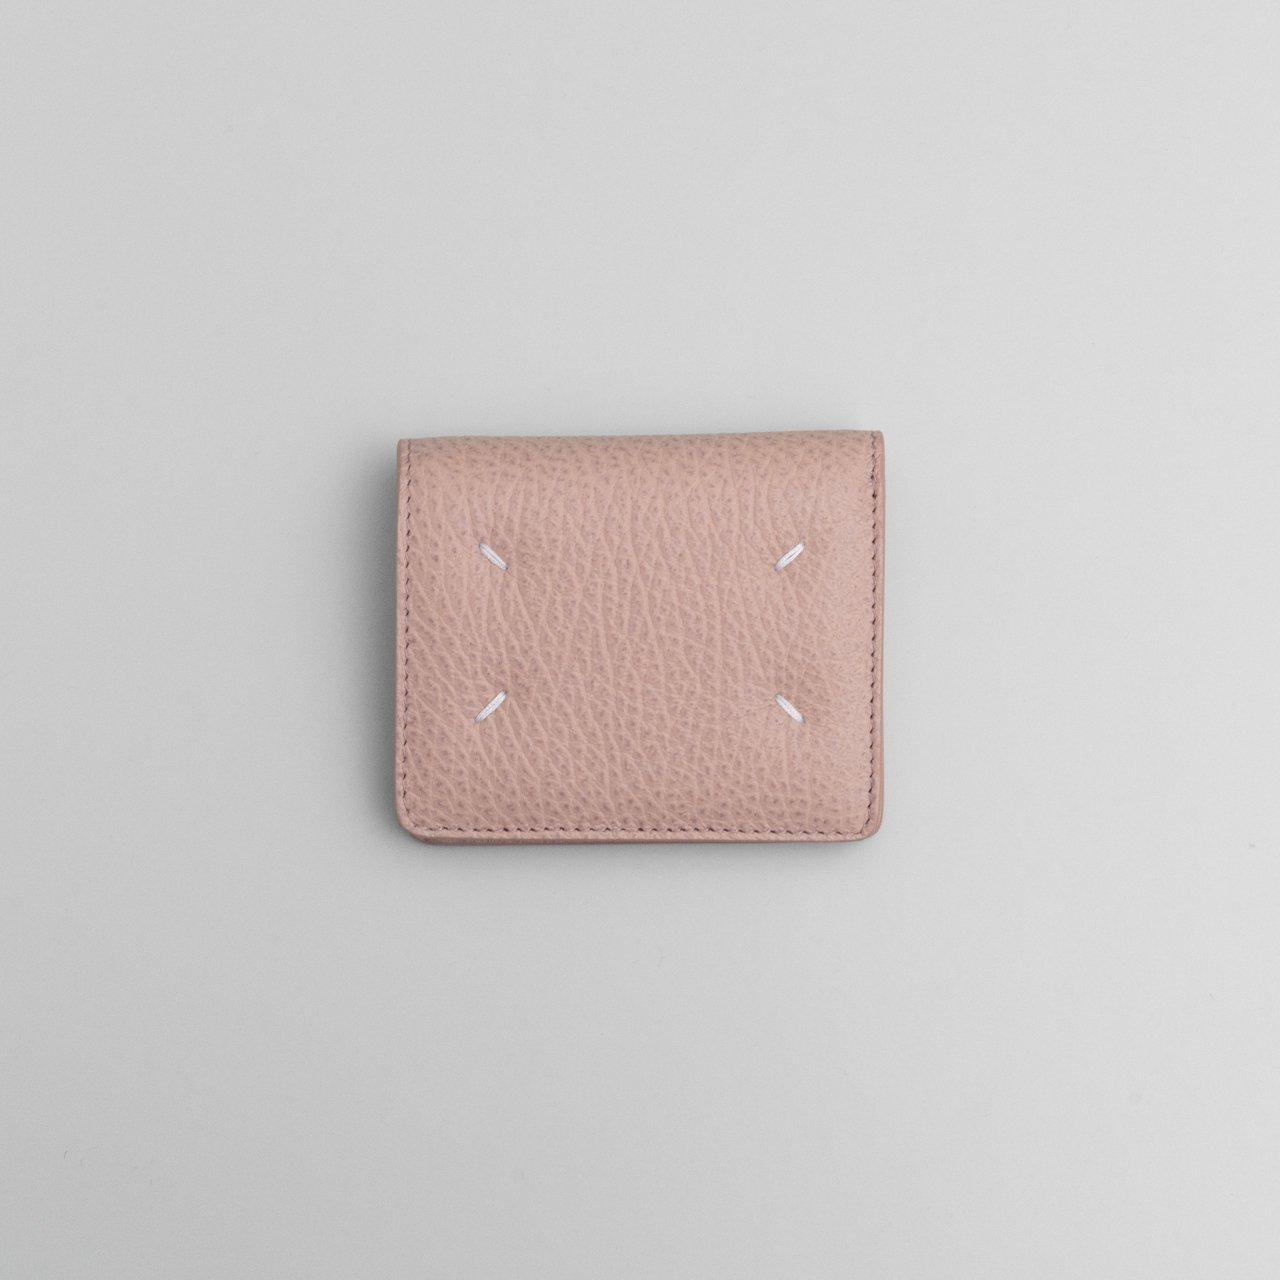 Maison Margiela PARIS <BR>レザー ポッパーウォレット<BR>ピンク